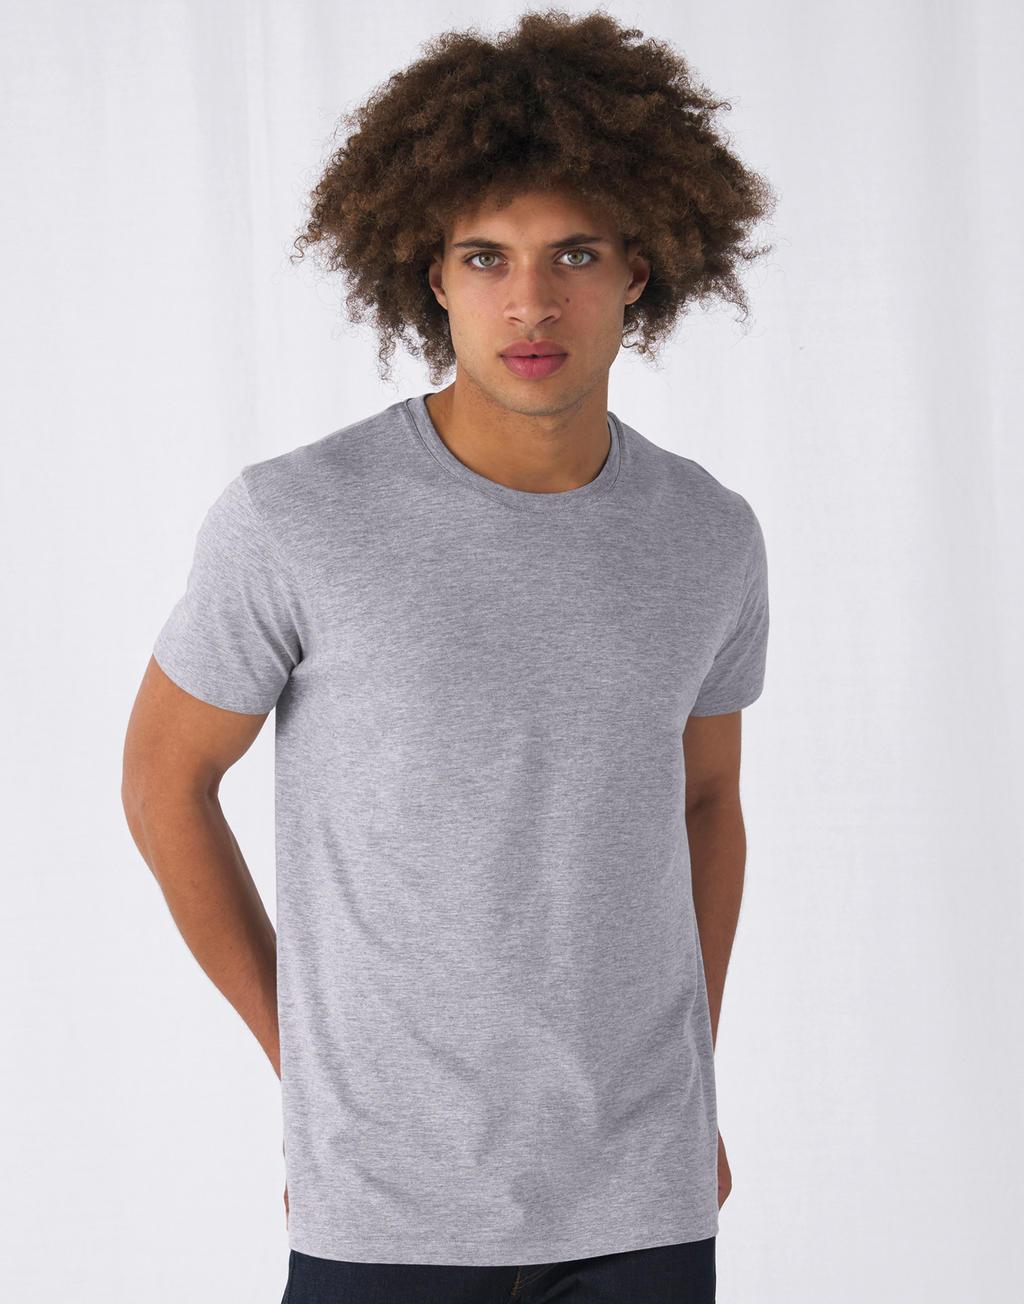 T-Shirt E150 #Organic